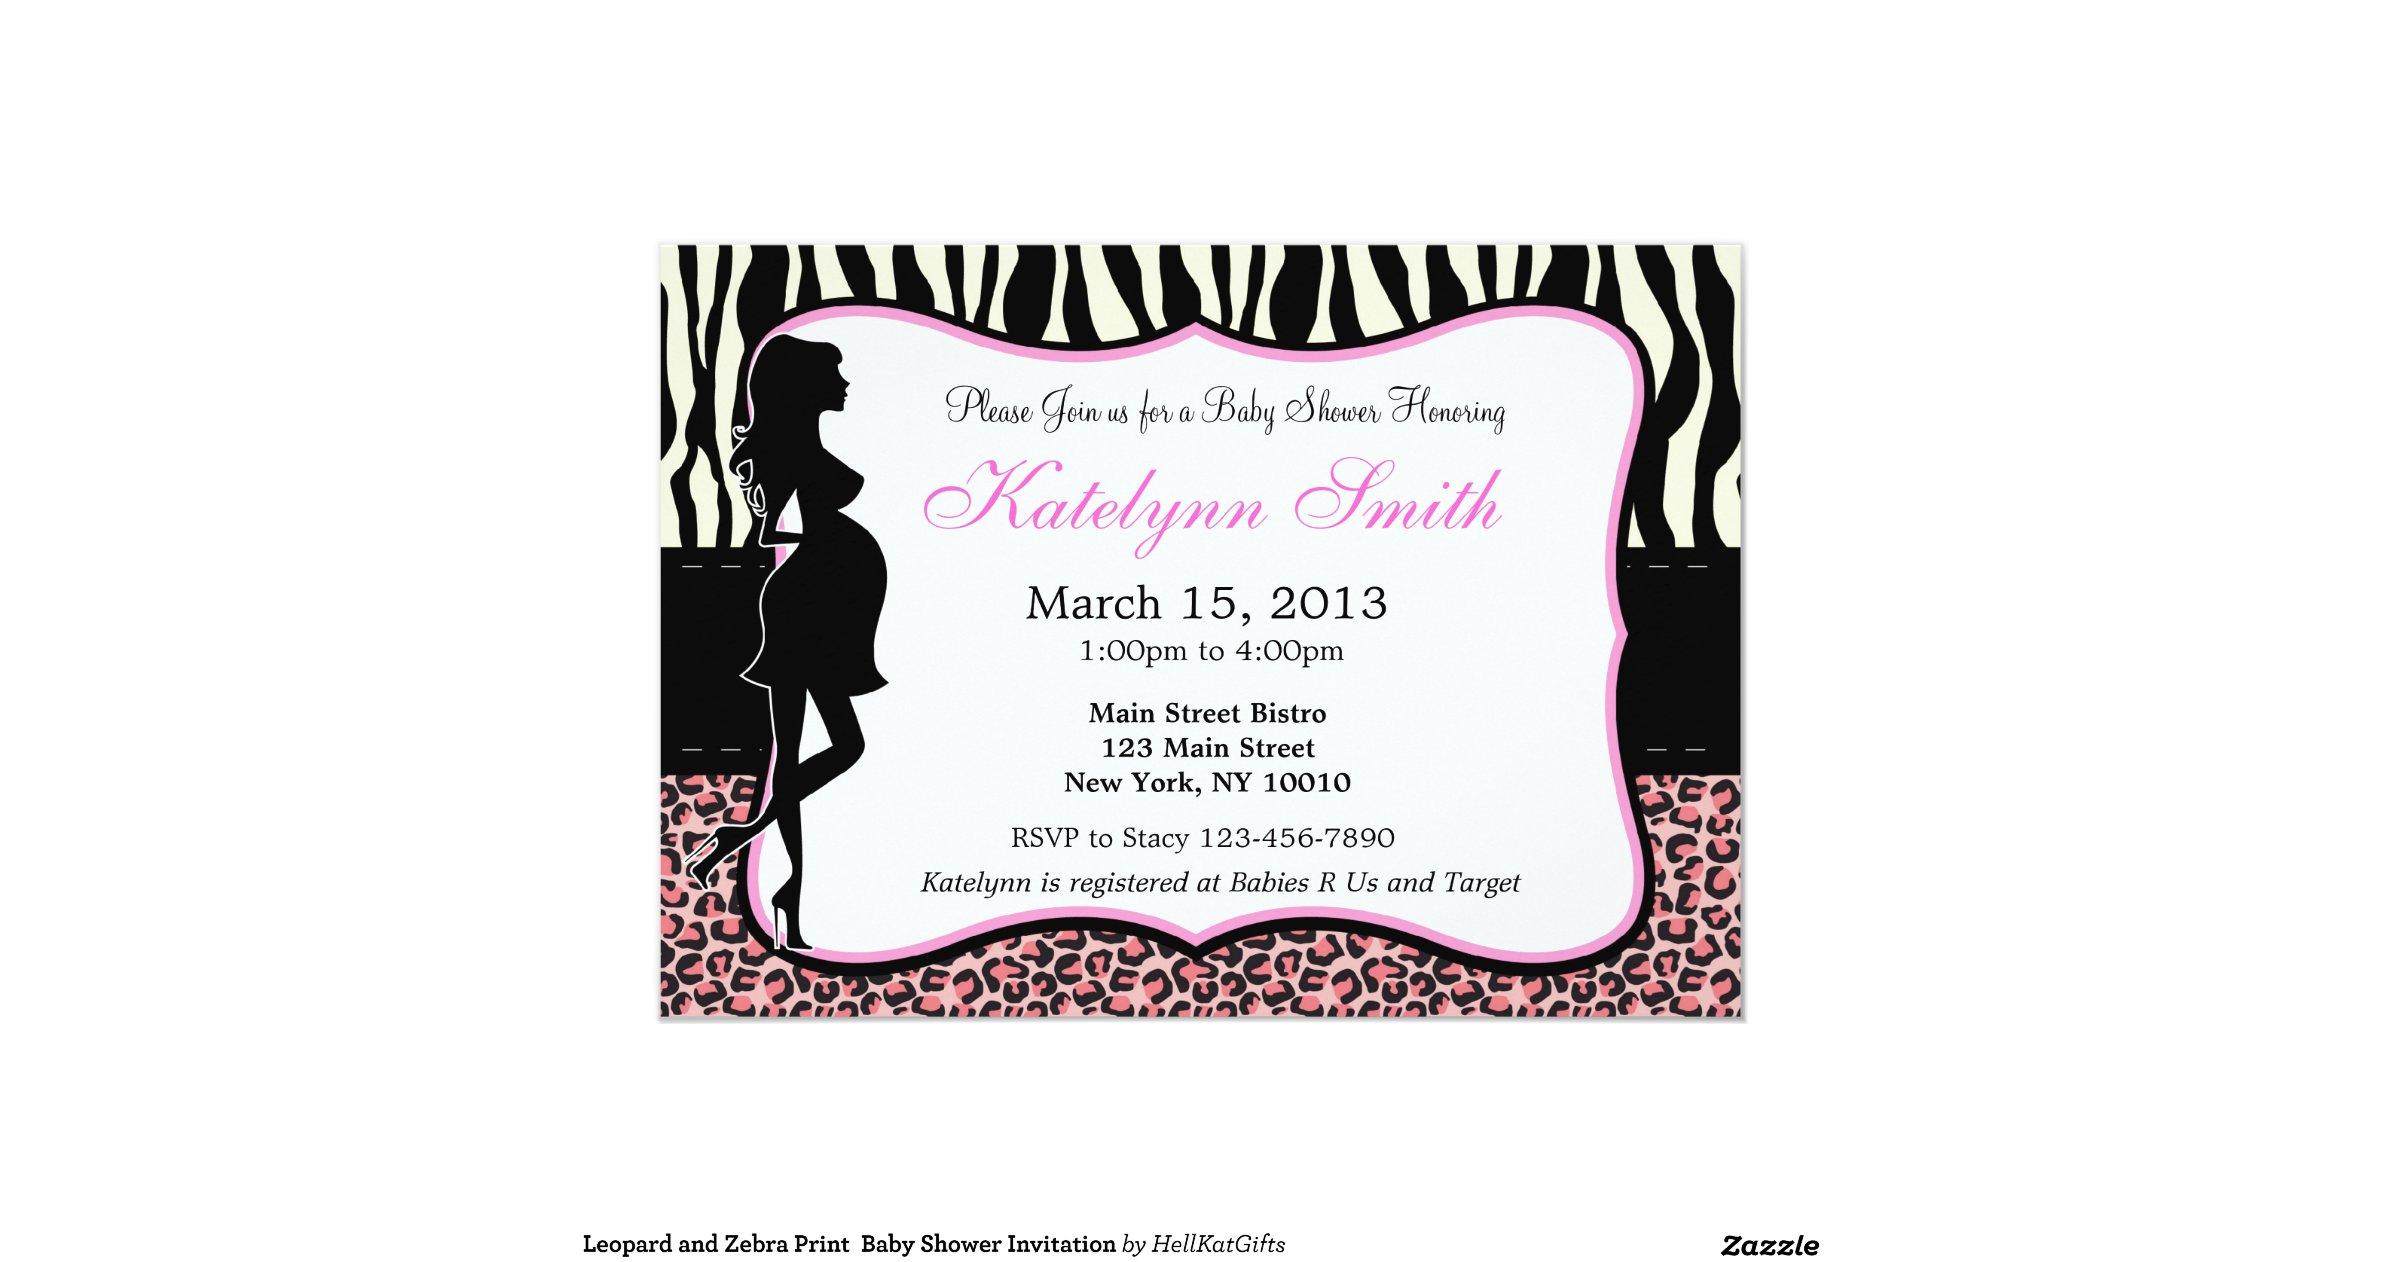 leopard and zebra print baby shower invitation